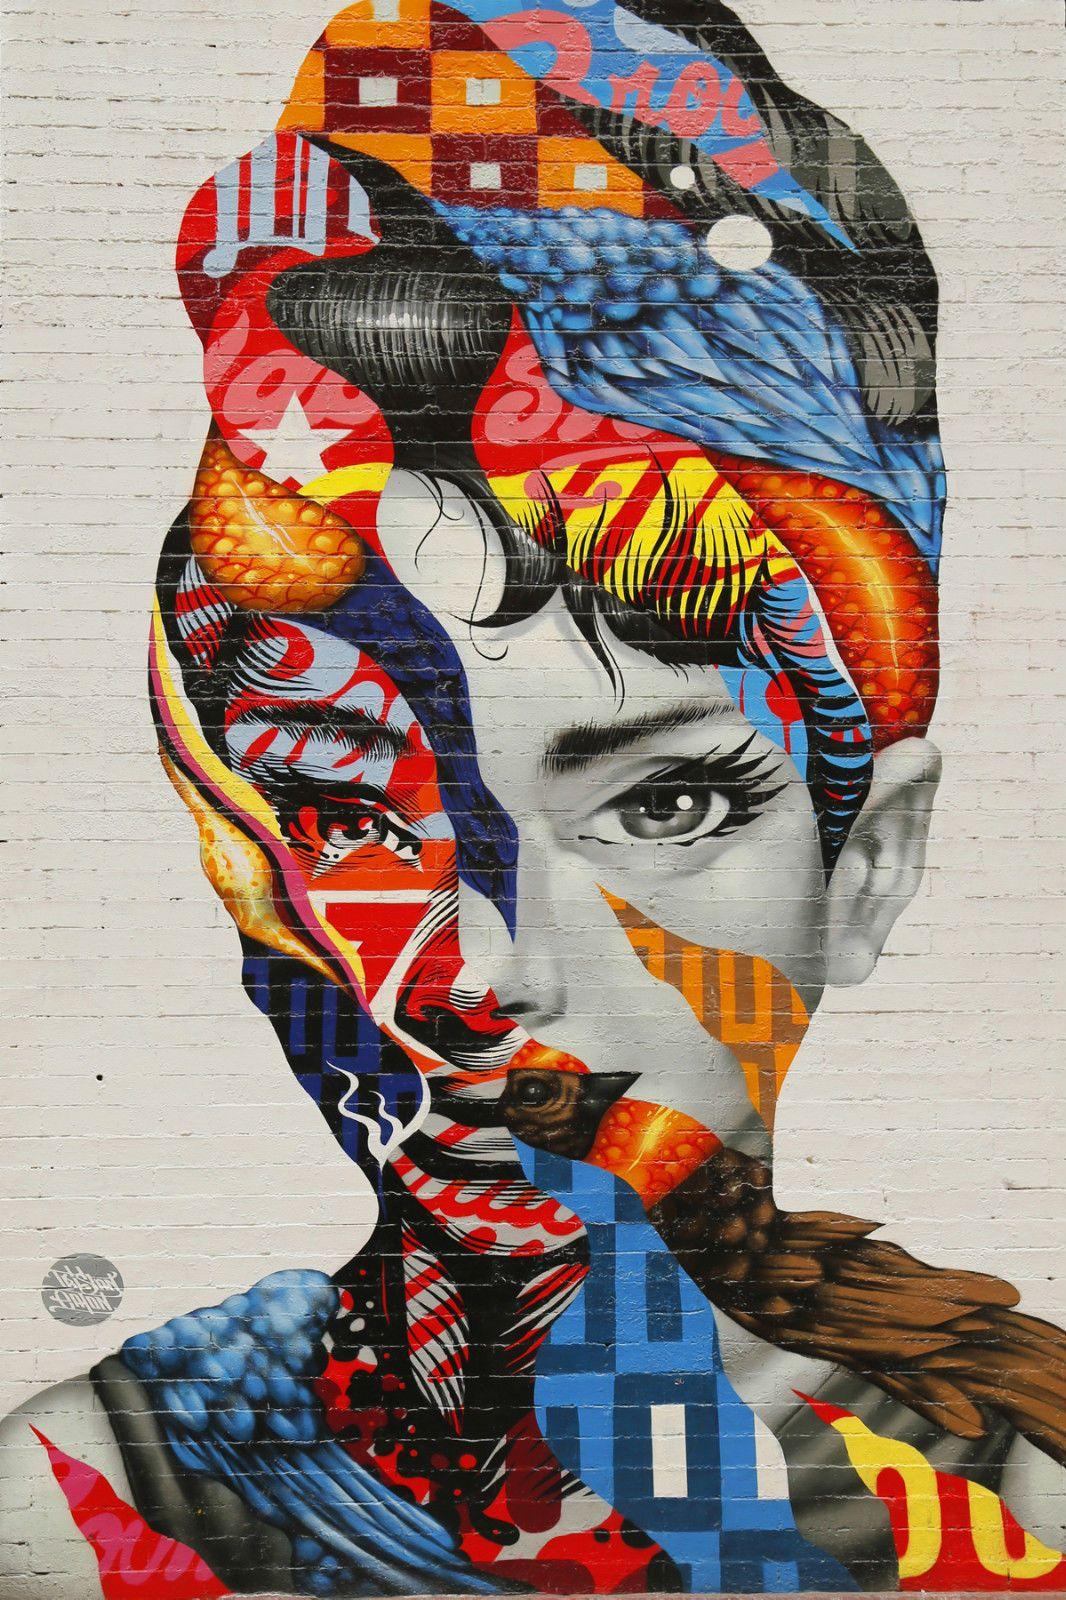 Details about beautiful graffiti street art canvas picture